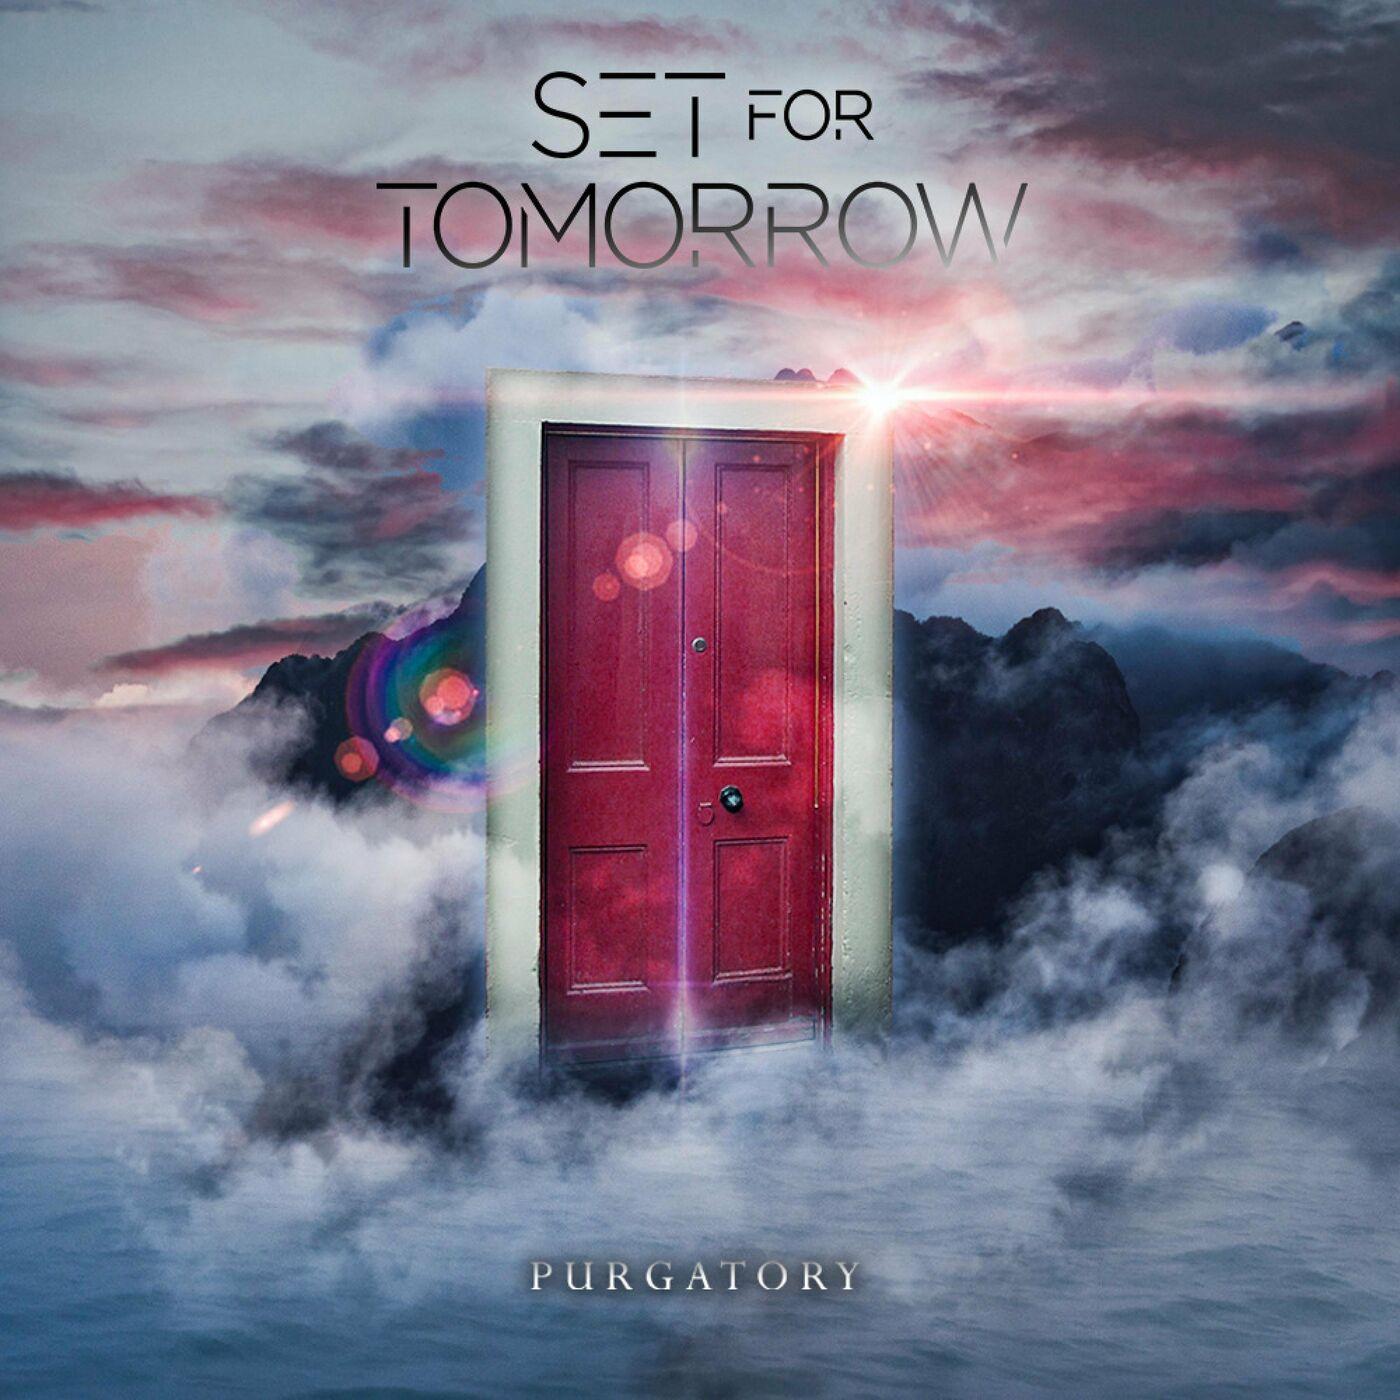 Set for Tomorrow - Purgatory [single] (2020)